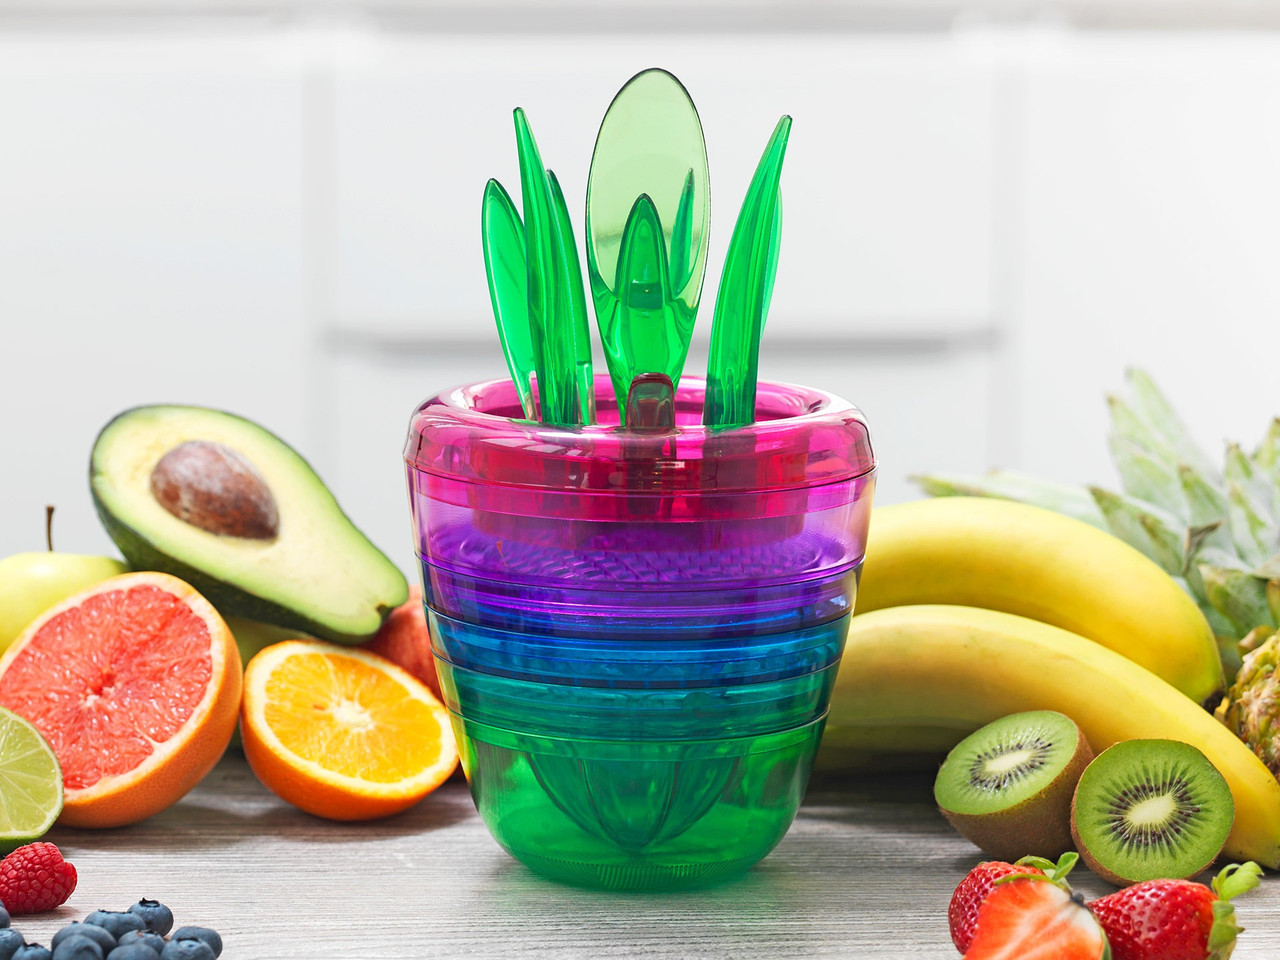 Брава устройство для нарезки фруктов Delimano Fruit Factory